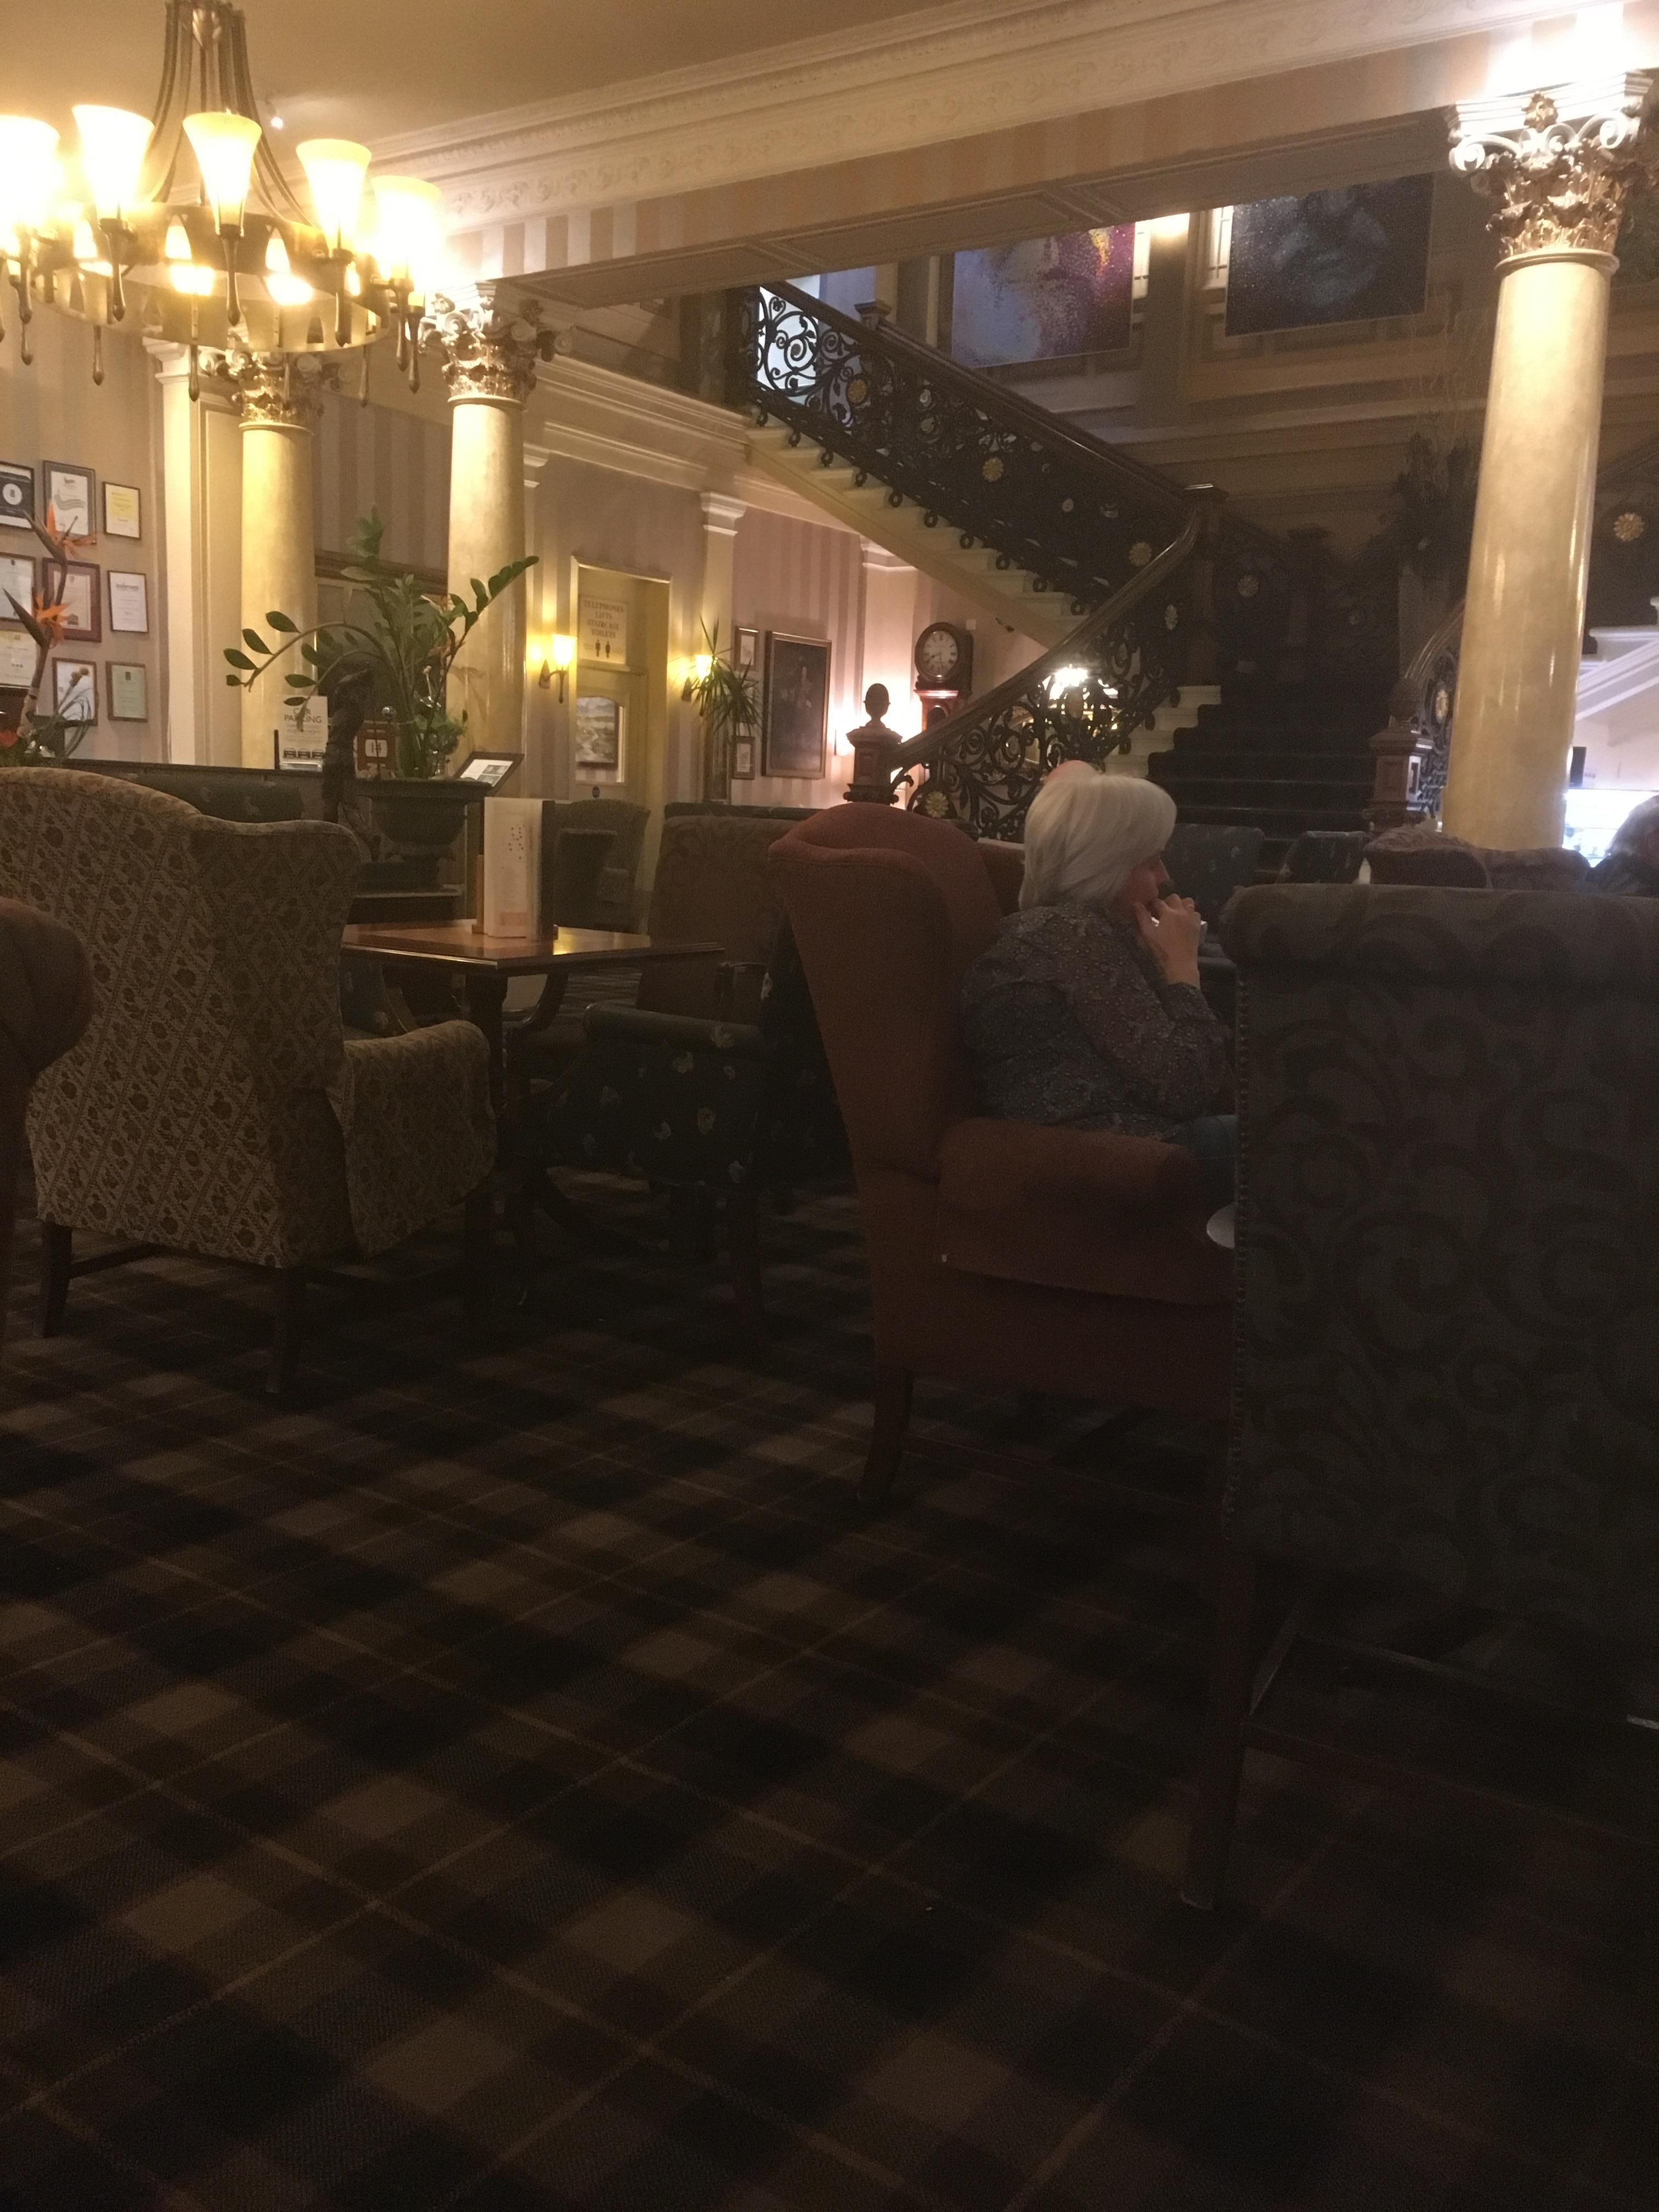 Hotel Sympathique Bien Situe Un Peu Defraichi